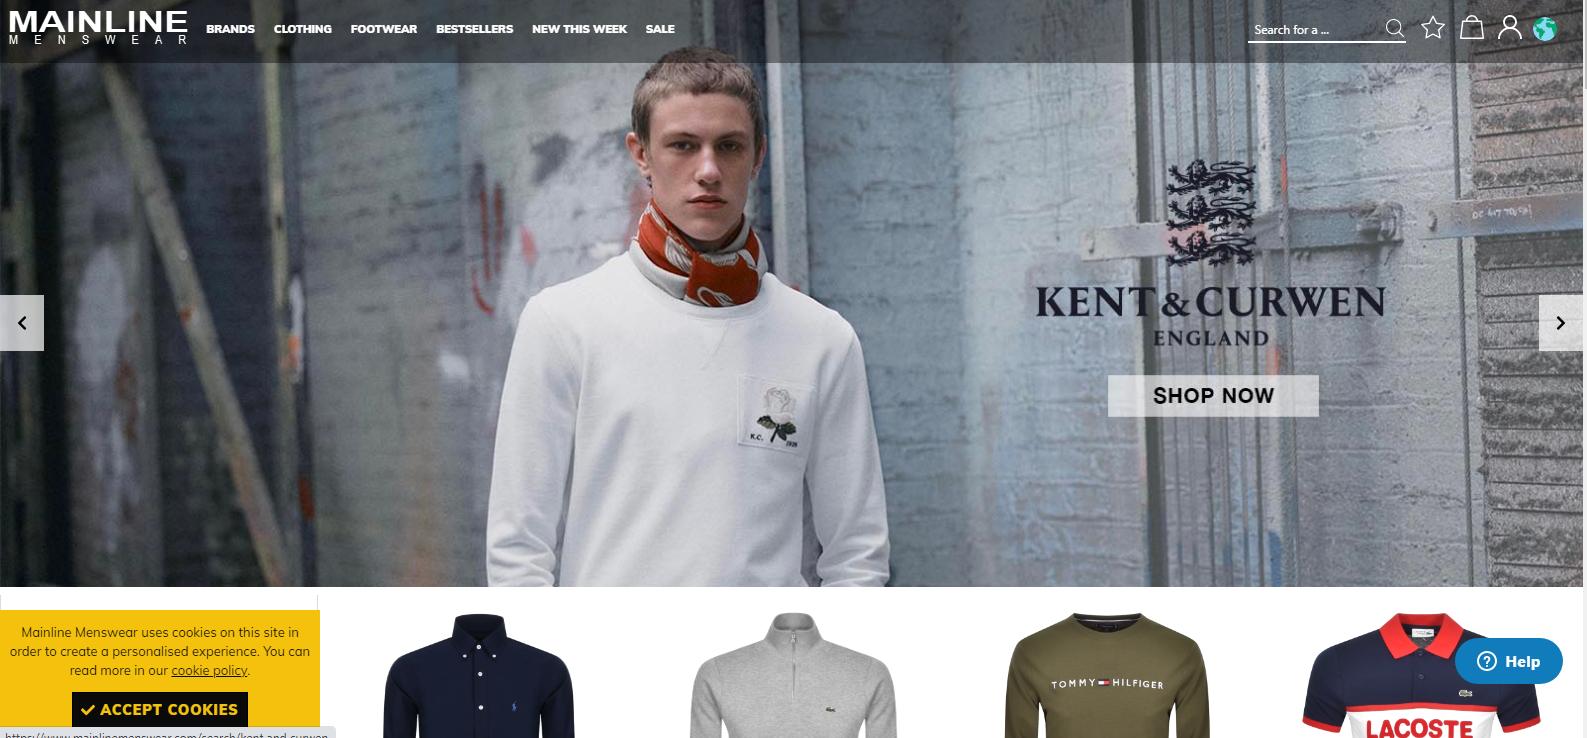 mainline menswear marketing automation example